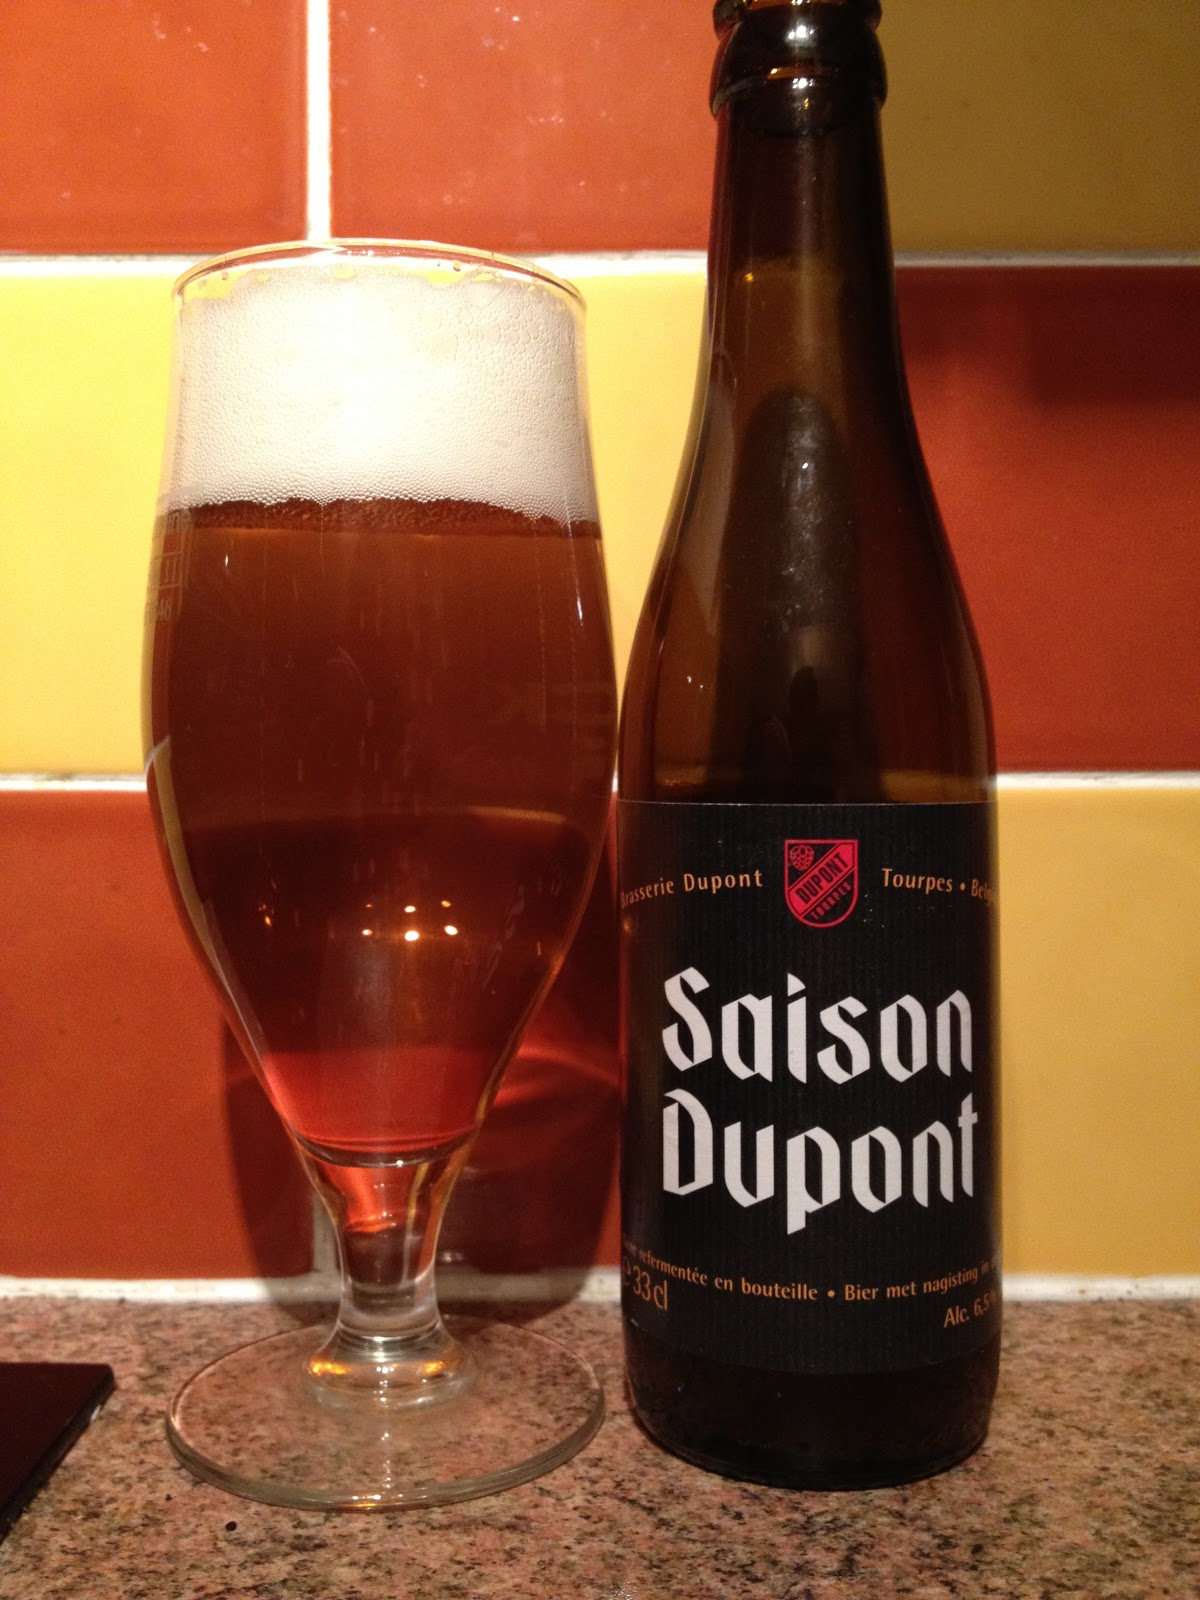 Misplaced Hours Brasserie Dupont Saison Dupont